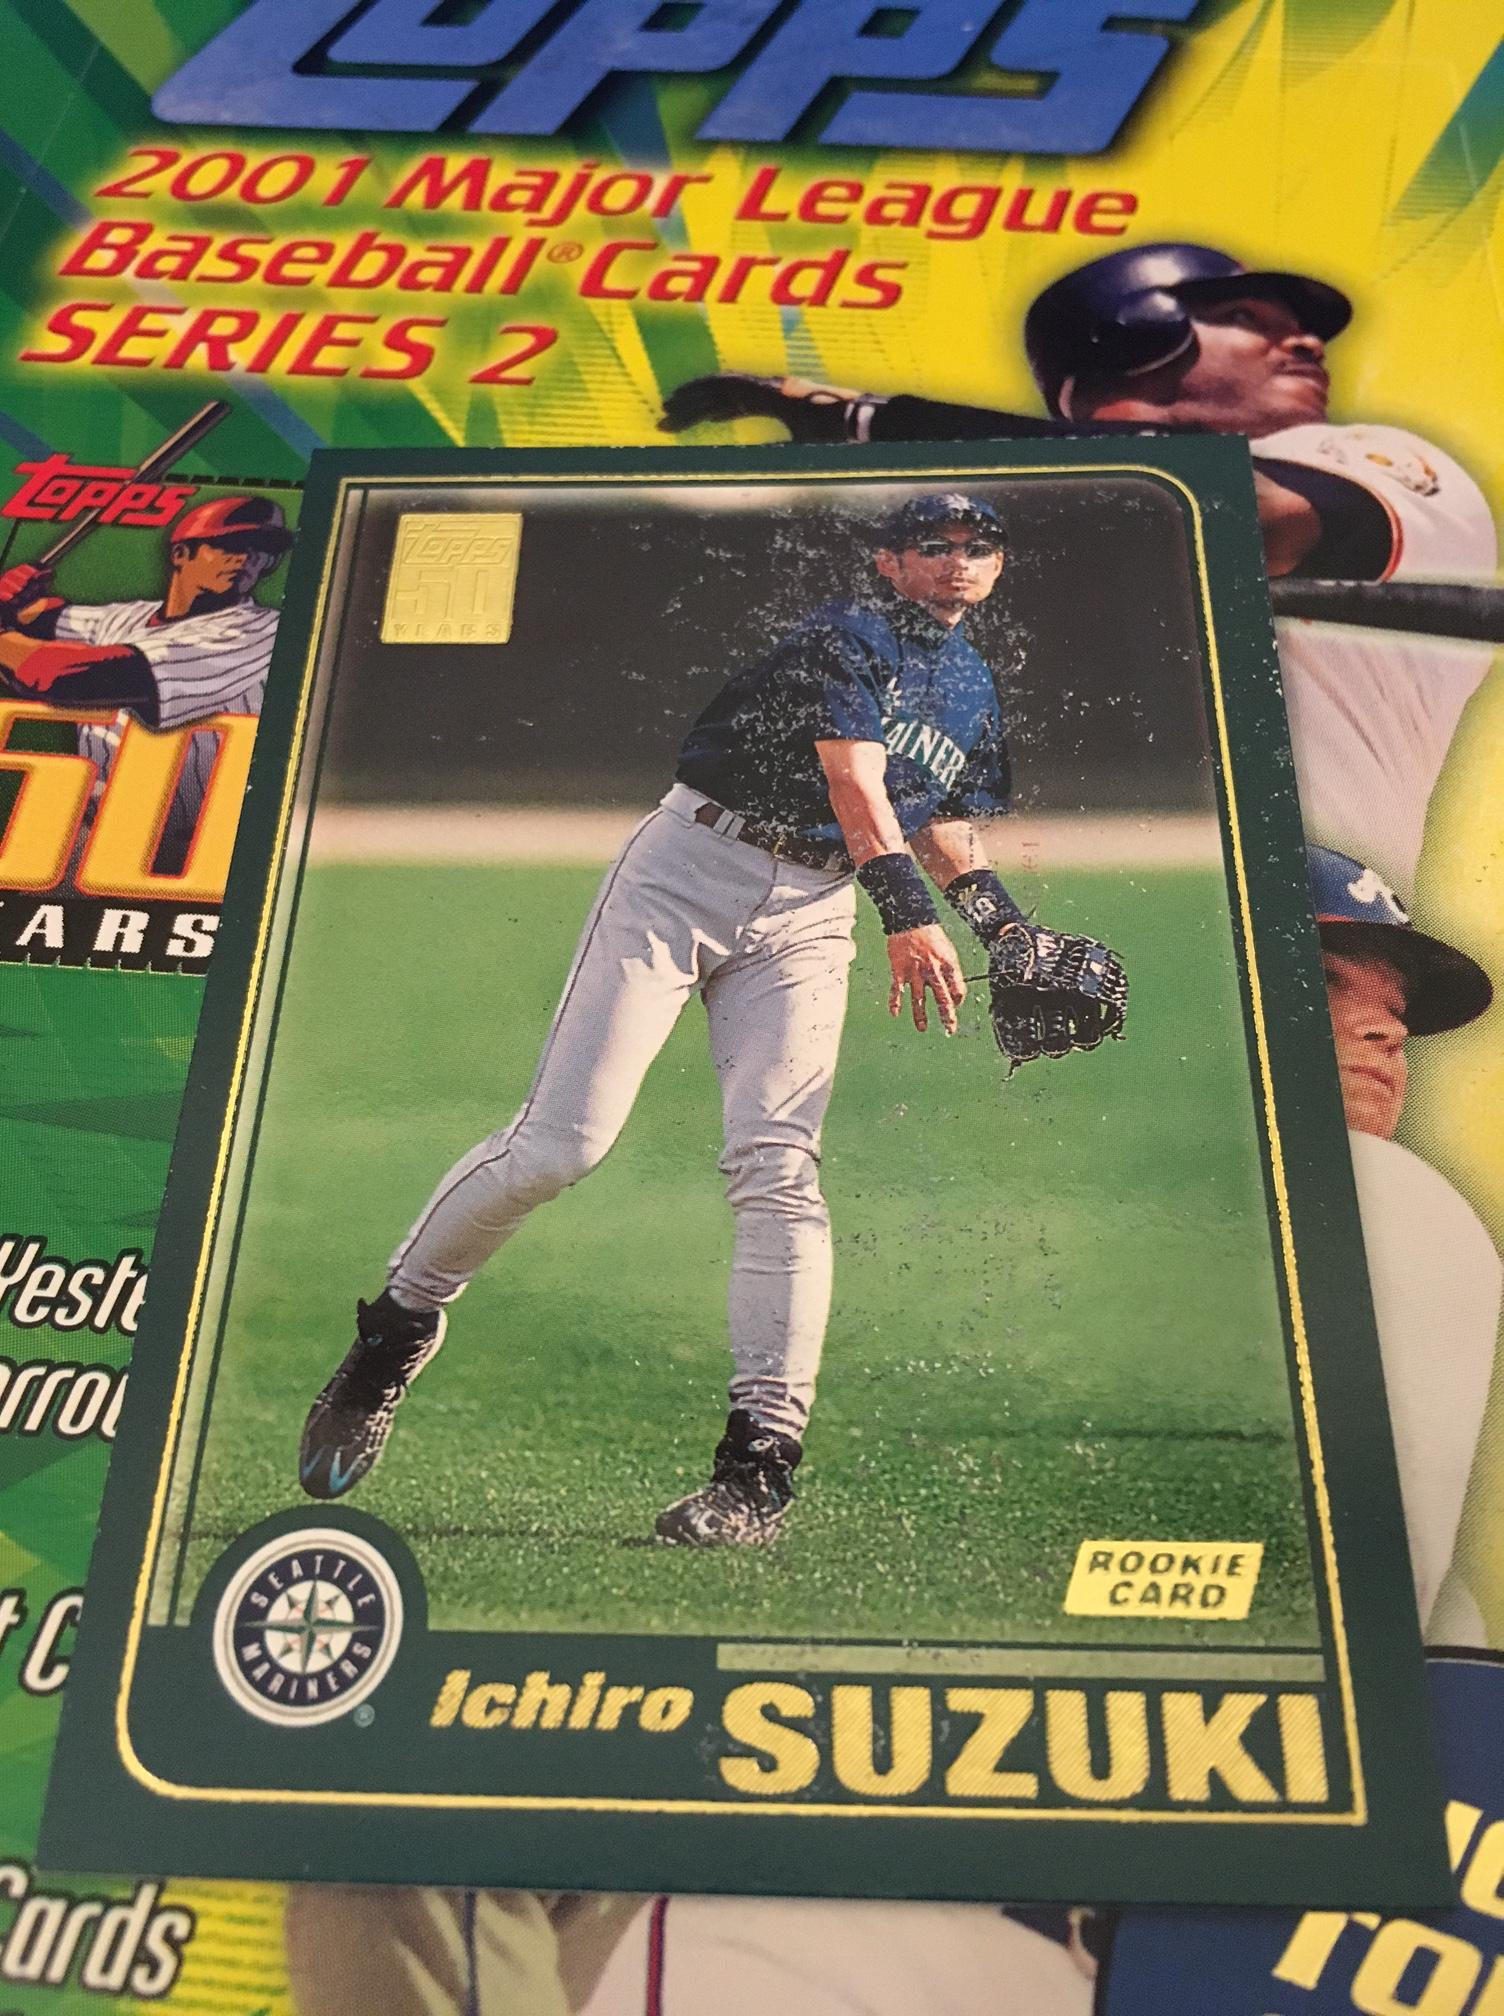 Chasing Ichiro Suzuki Rc Prompts Reminder Amid June